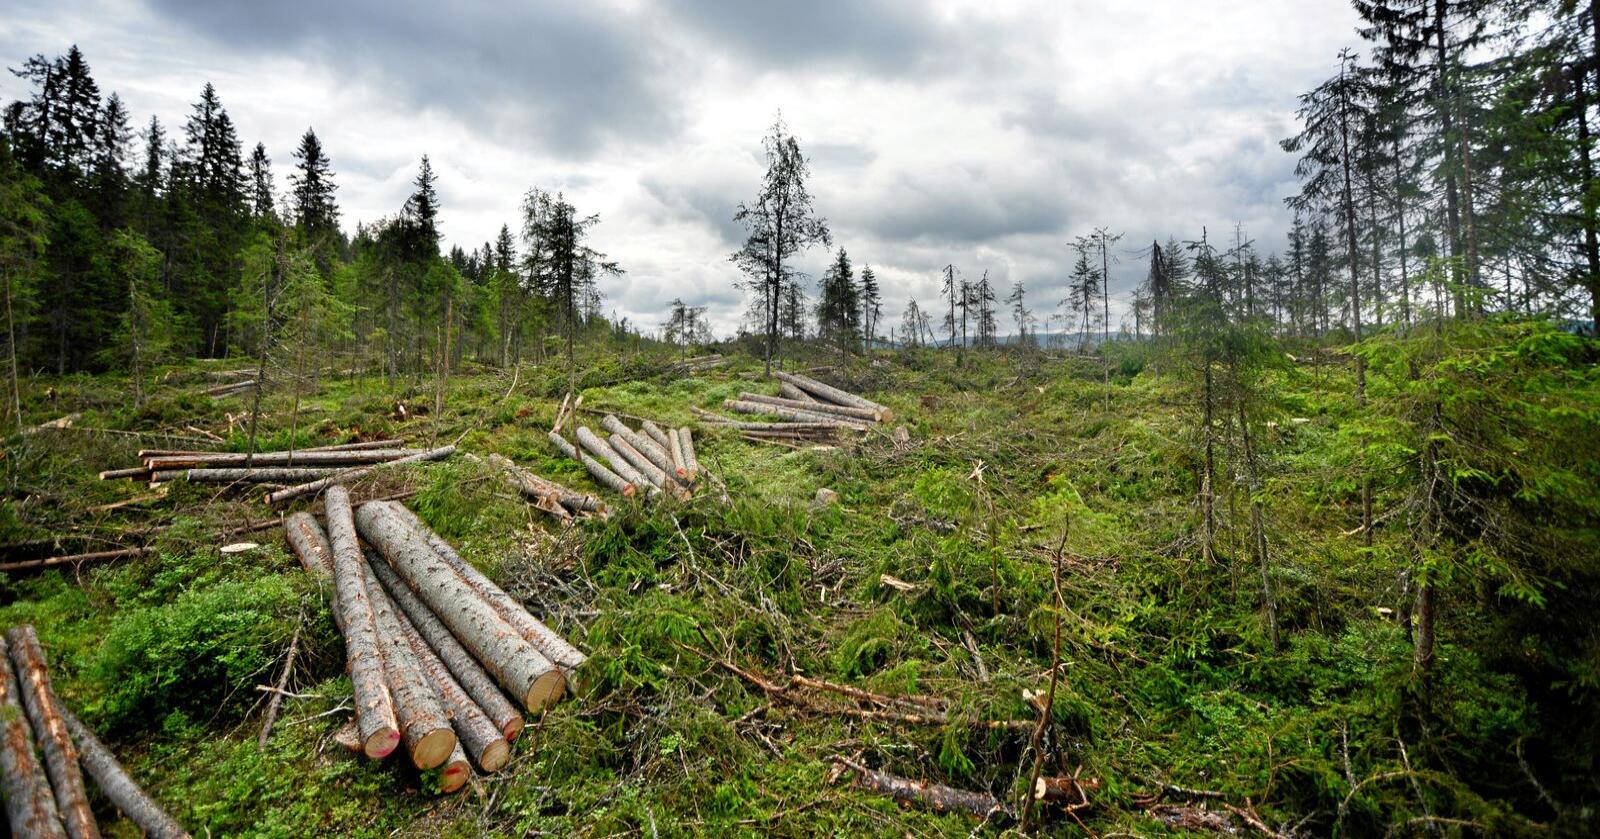 Skog: Kan spille en rolle som fornybar ressurs i det grønne skiftet. Foto: Siri Juell Rasmussen